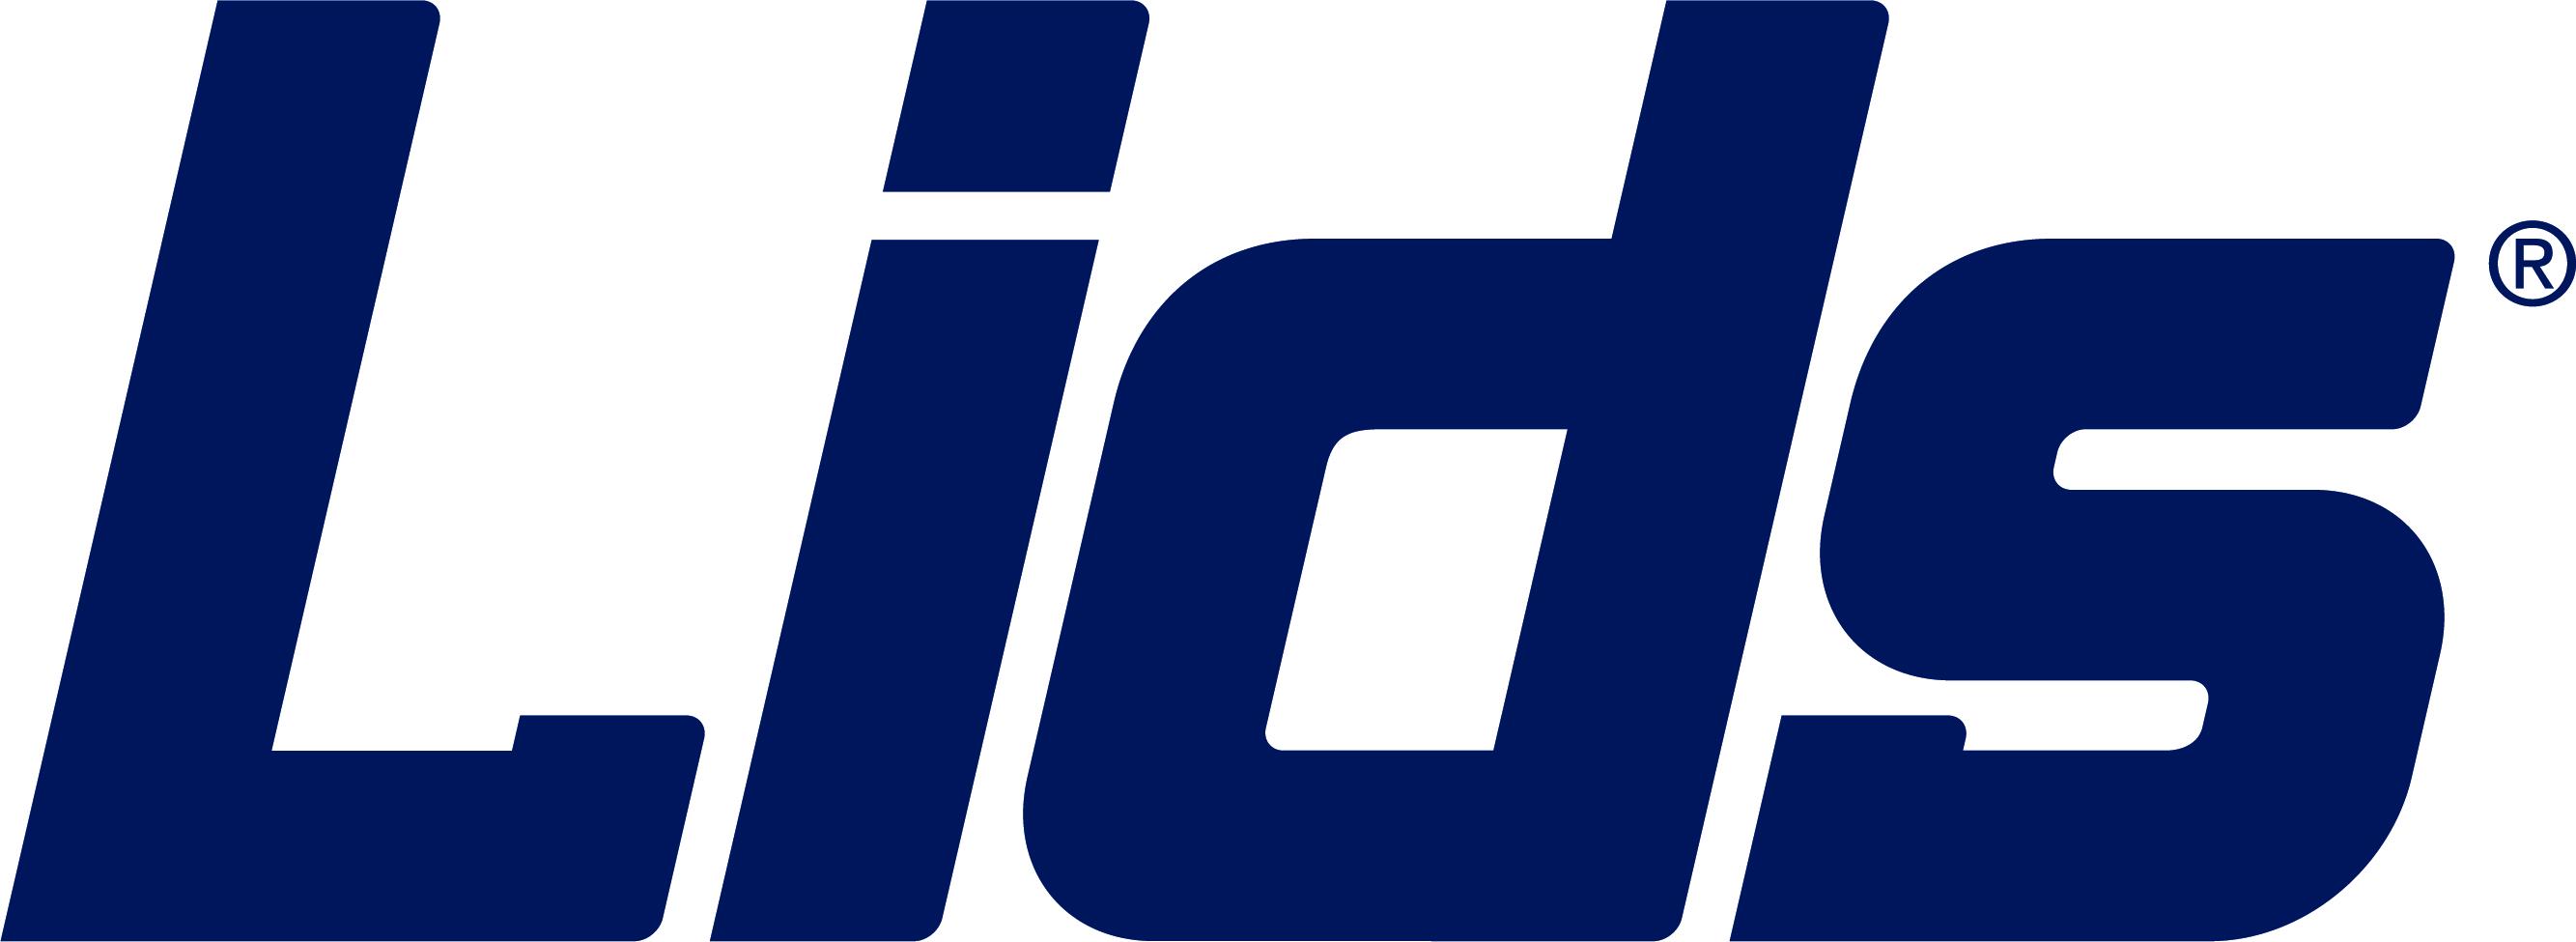 LIDS_logo_Primary_CMYK.jpg